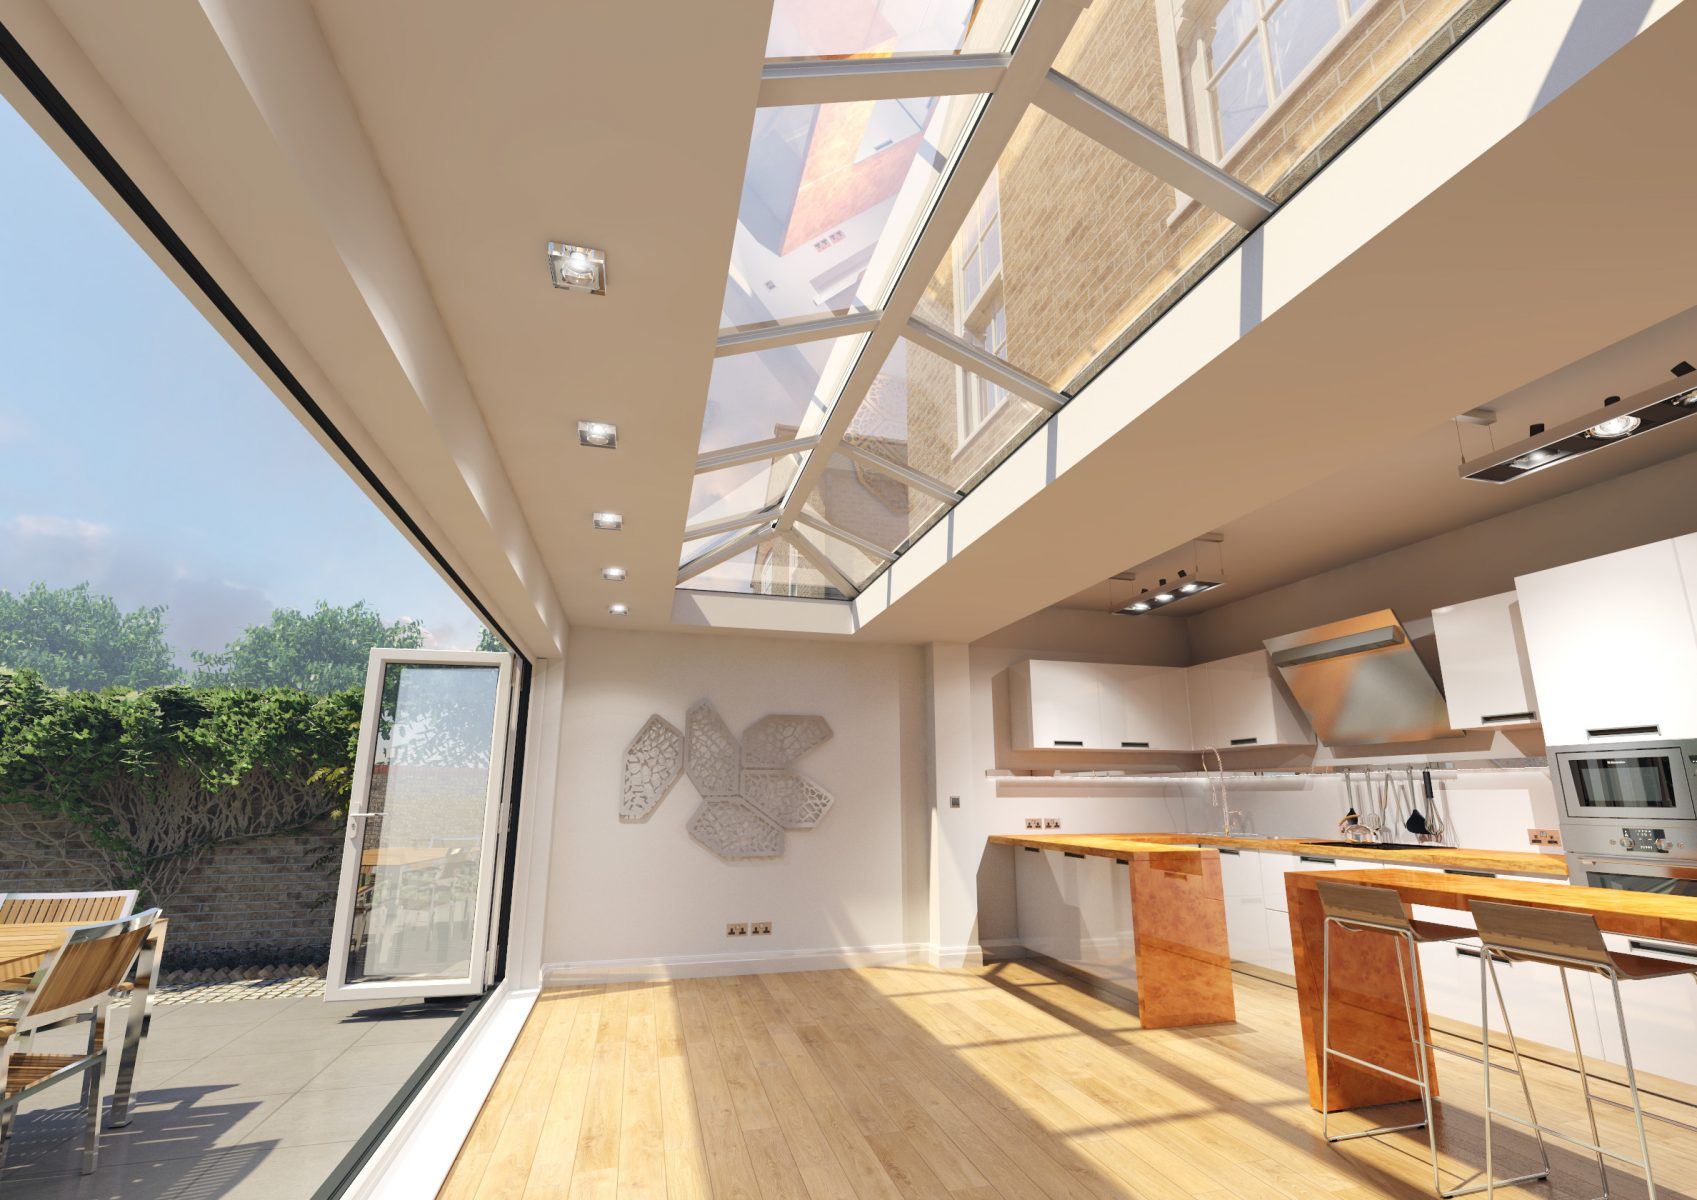 Skypod Roof Lantern - Interior